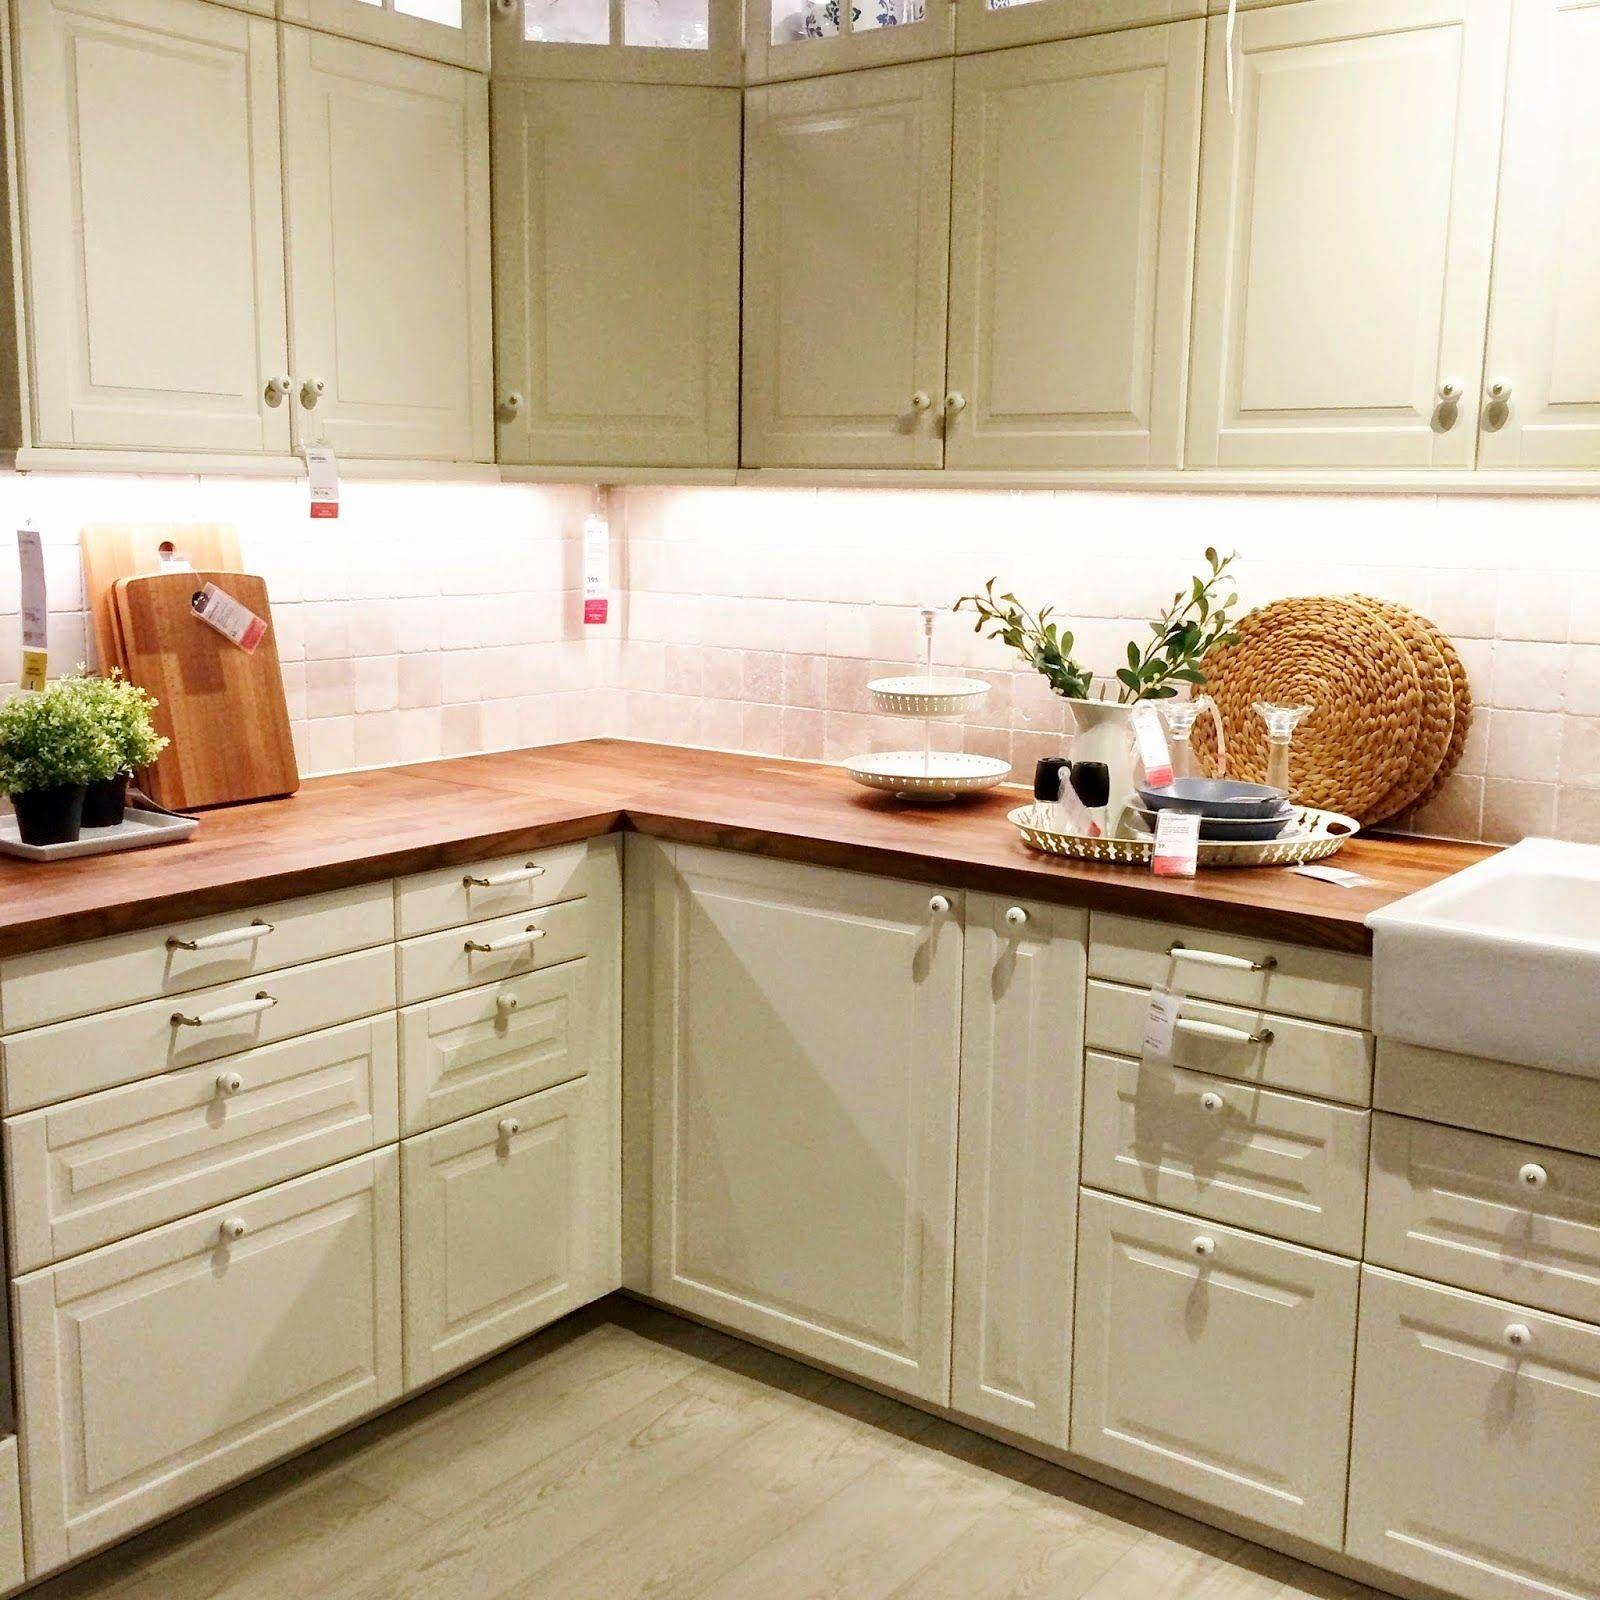 Craigslist Victoria Kitchen Cabinets Fresh Ikea Bodbyn Ideas For The House Pinterest Kjokken Hus